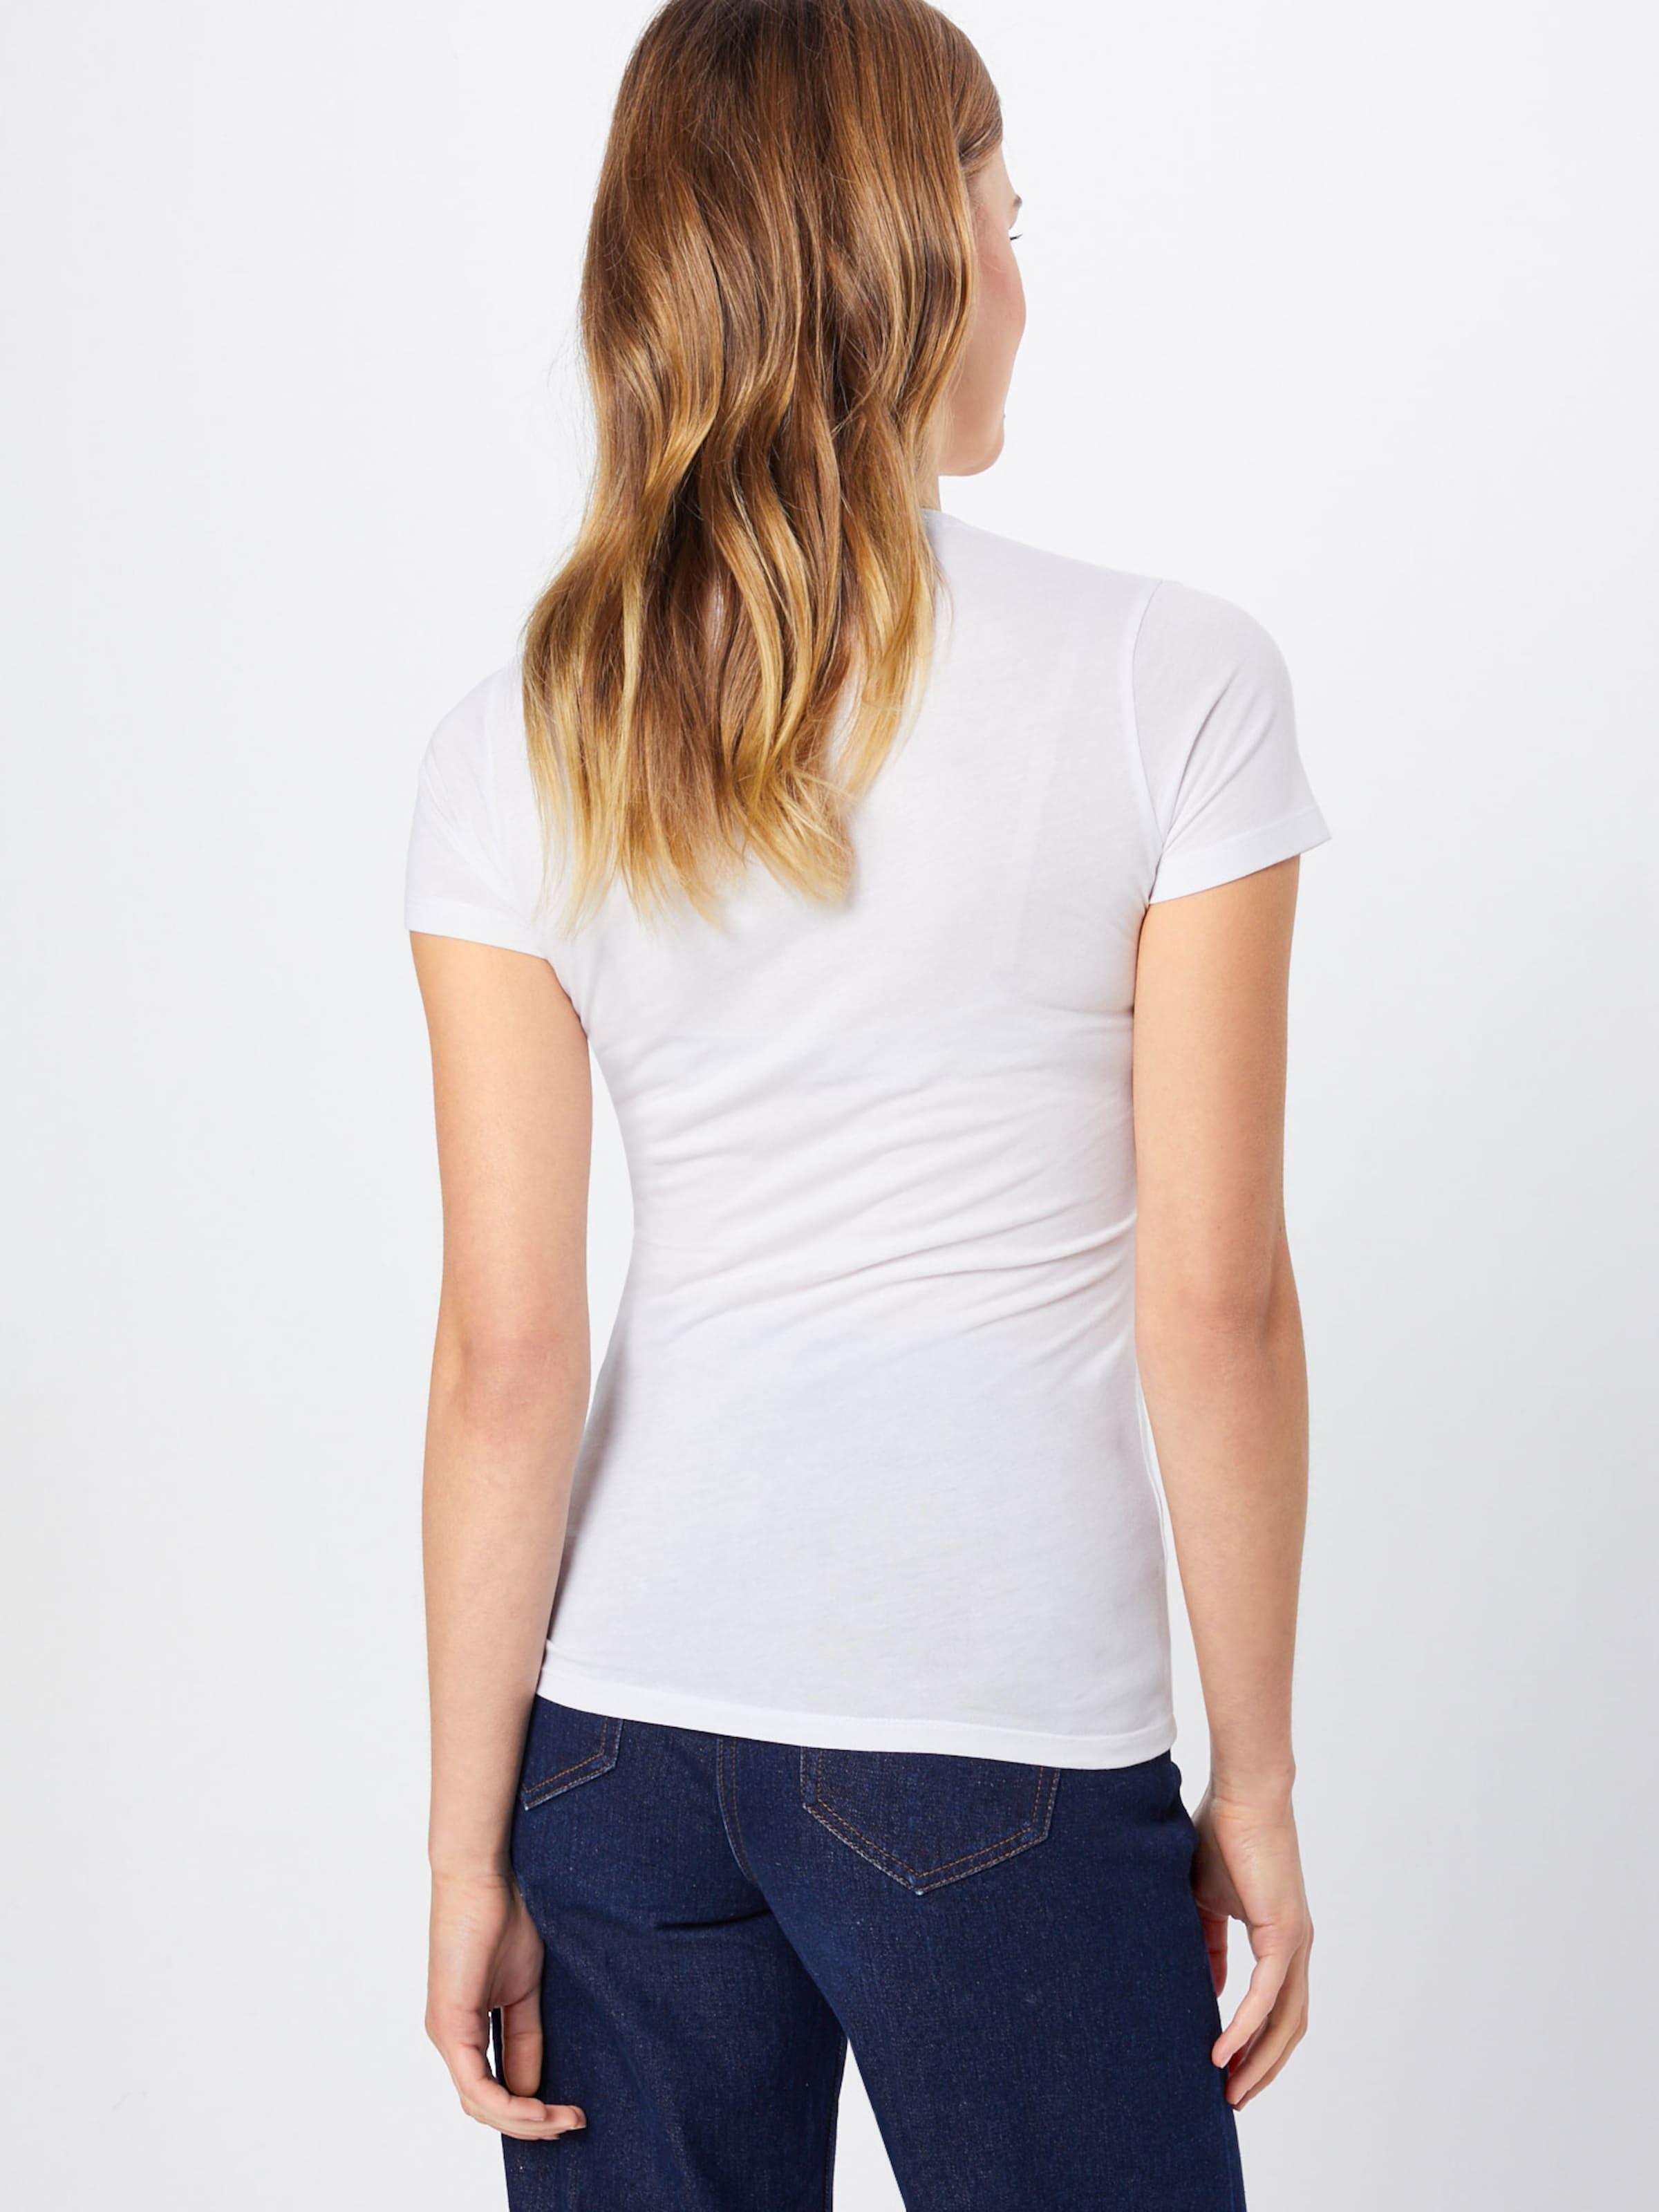 Jeans En 'andrea' Bleu shirt T Pepe ClairBlanc WED9H2I